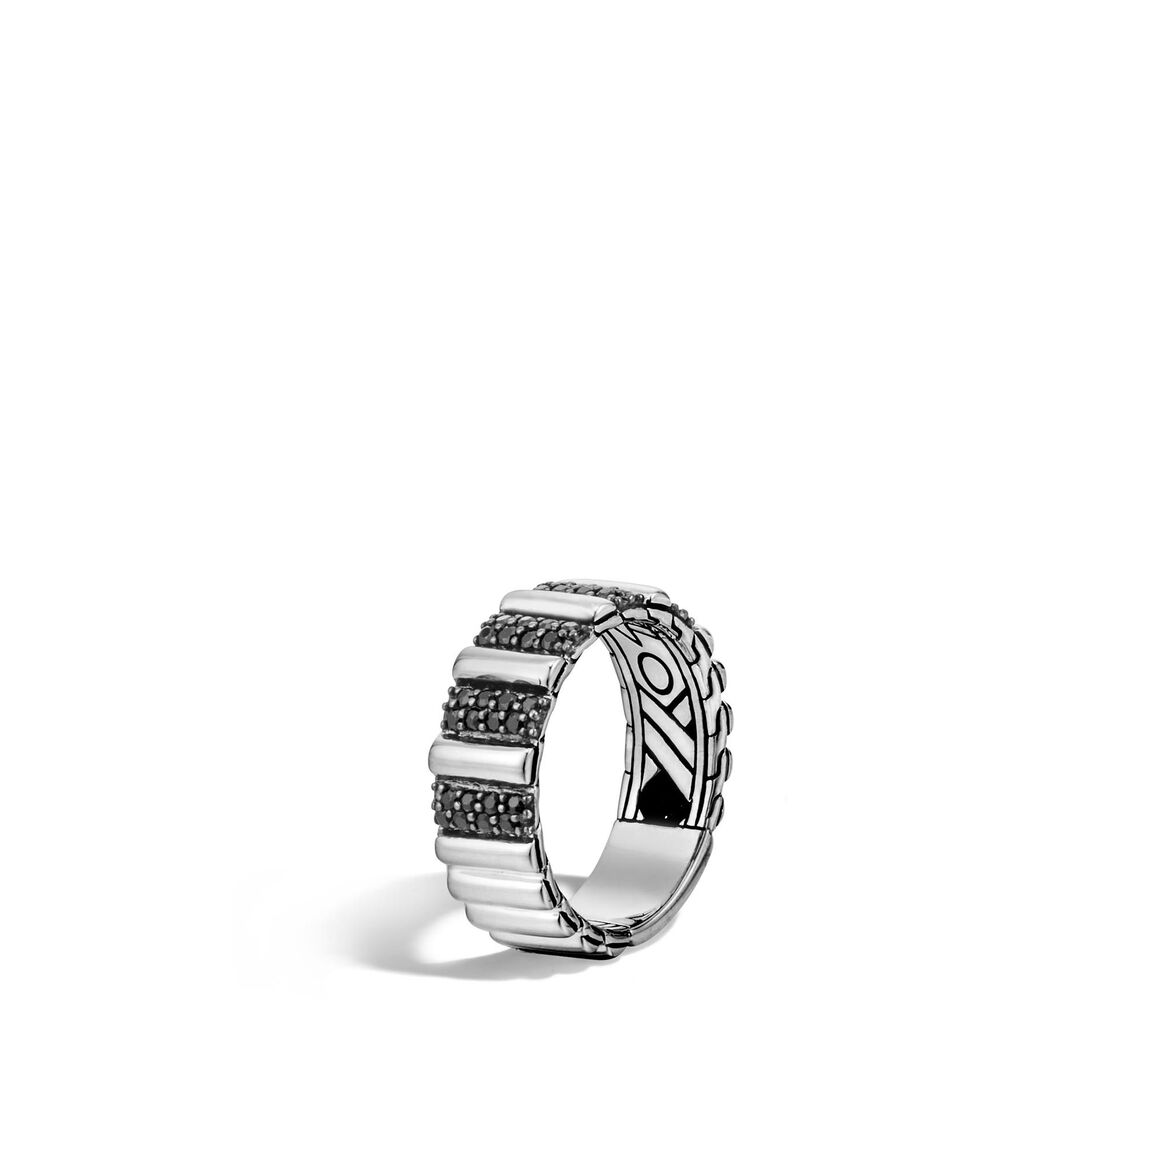 Bedeg Band Ring